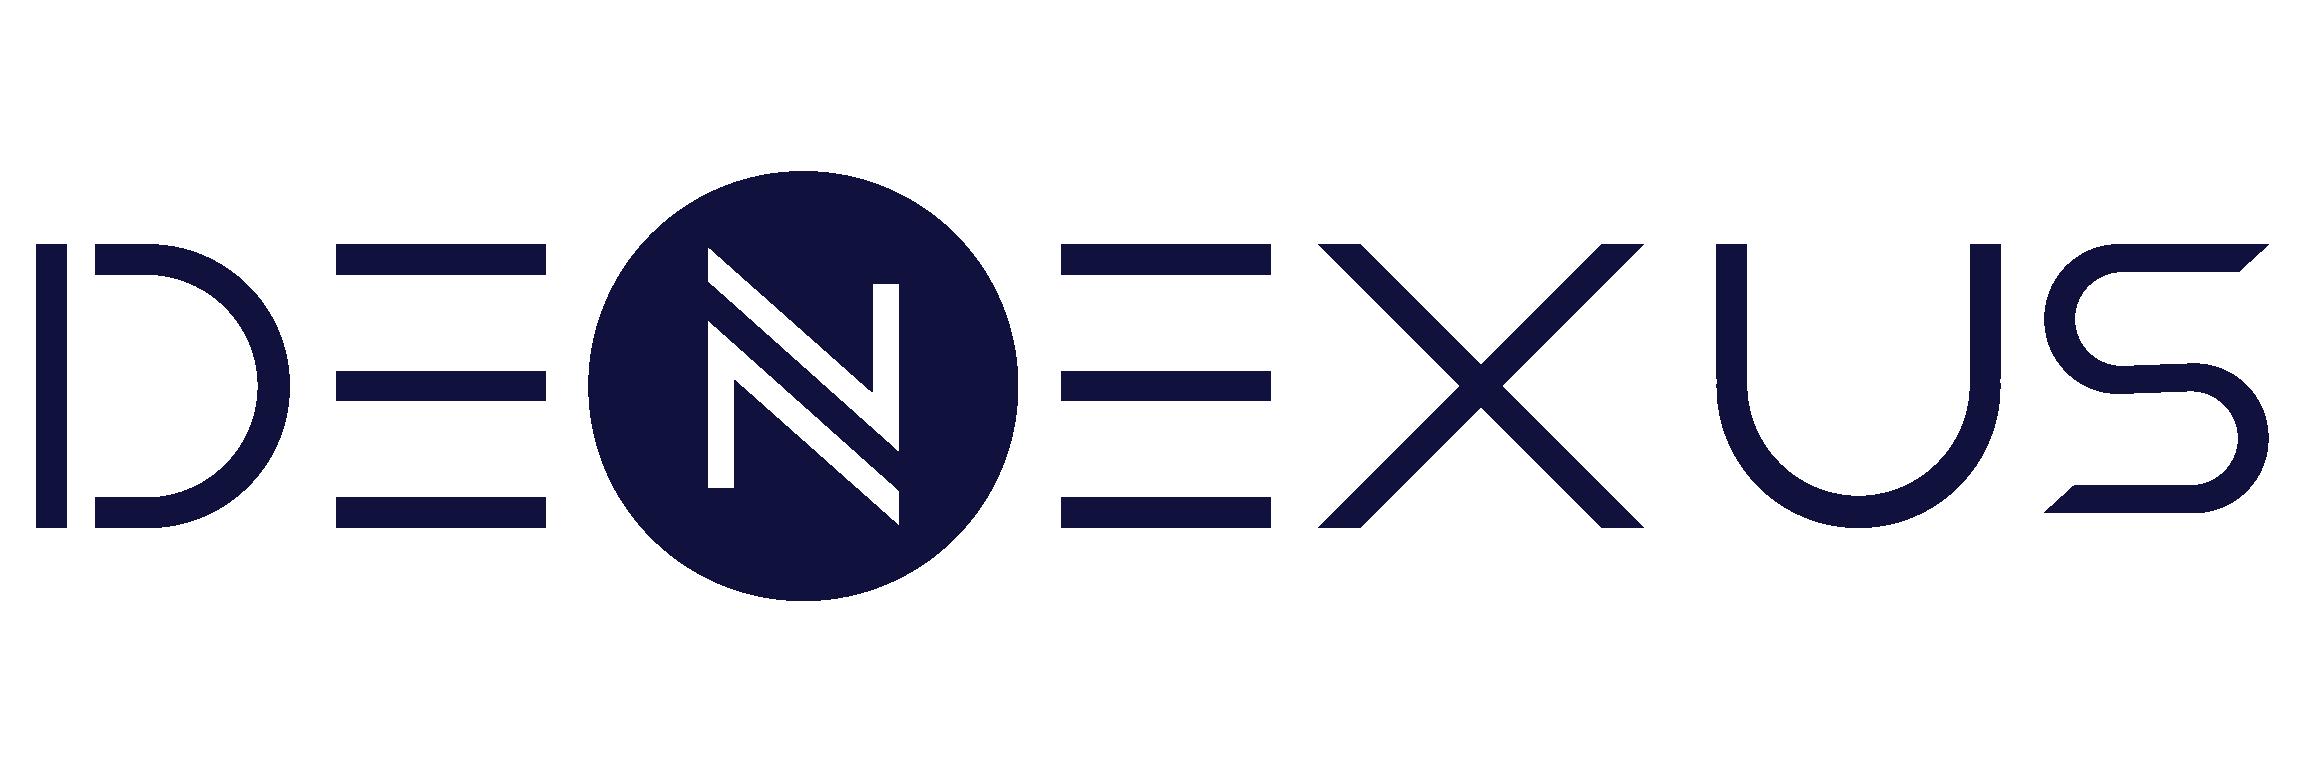 Denexus_MainLogos_Navy (1)